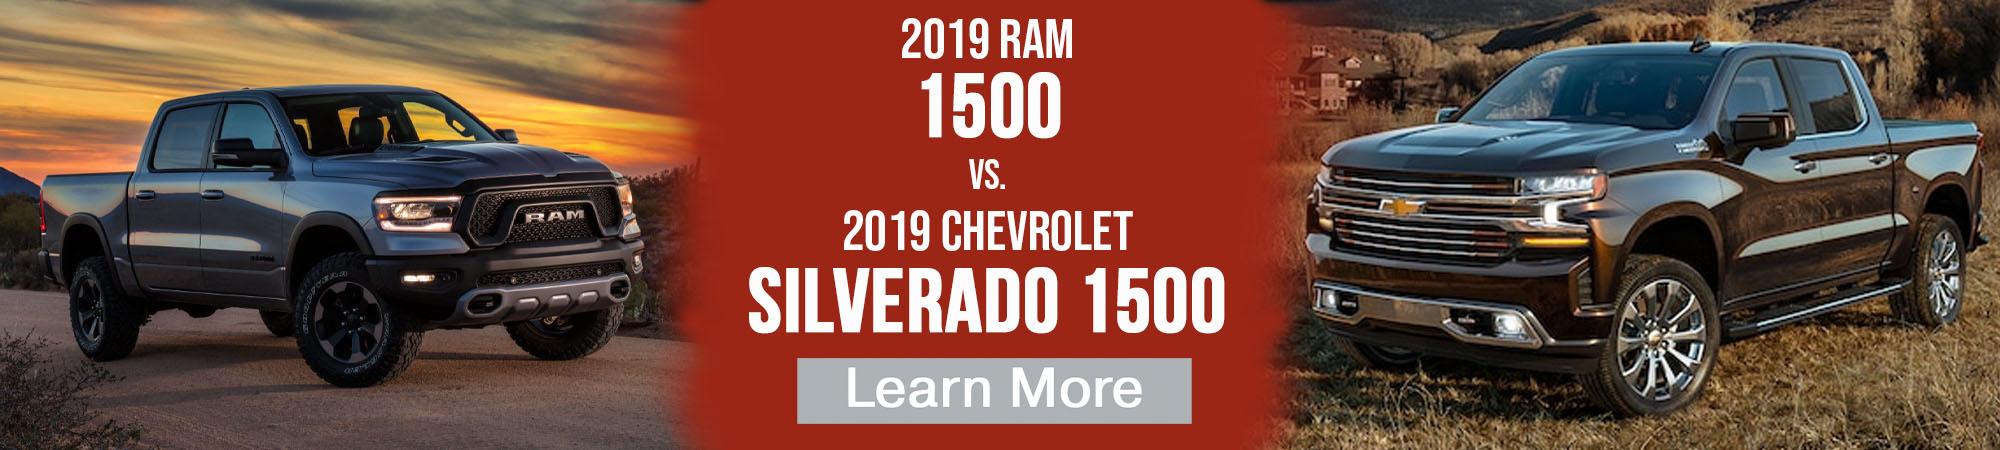 2019 Ram 1500 vs 2019 Chevrolet Silverado 1500